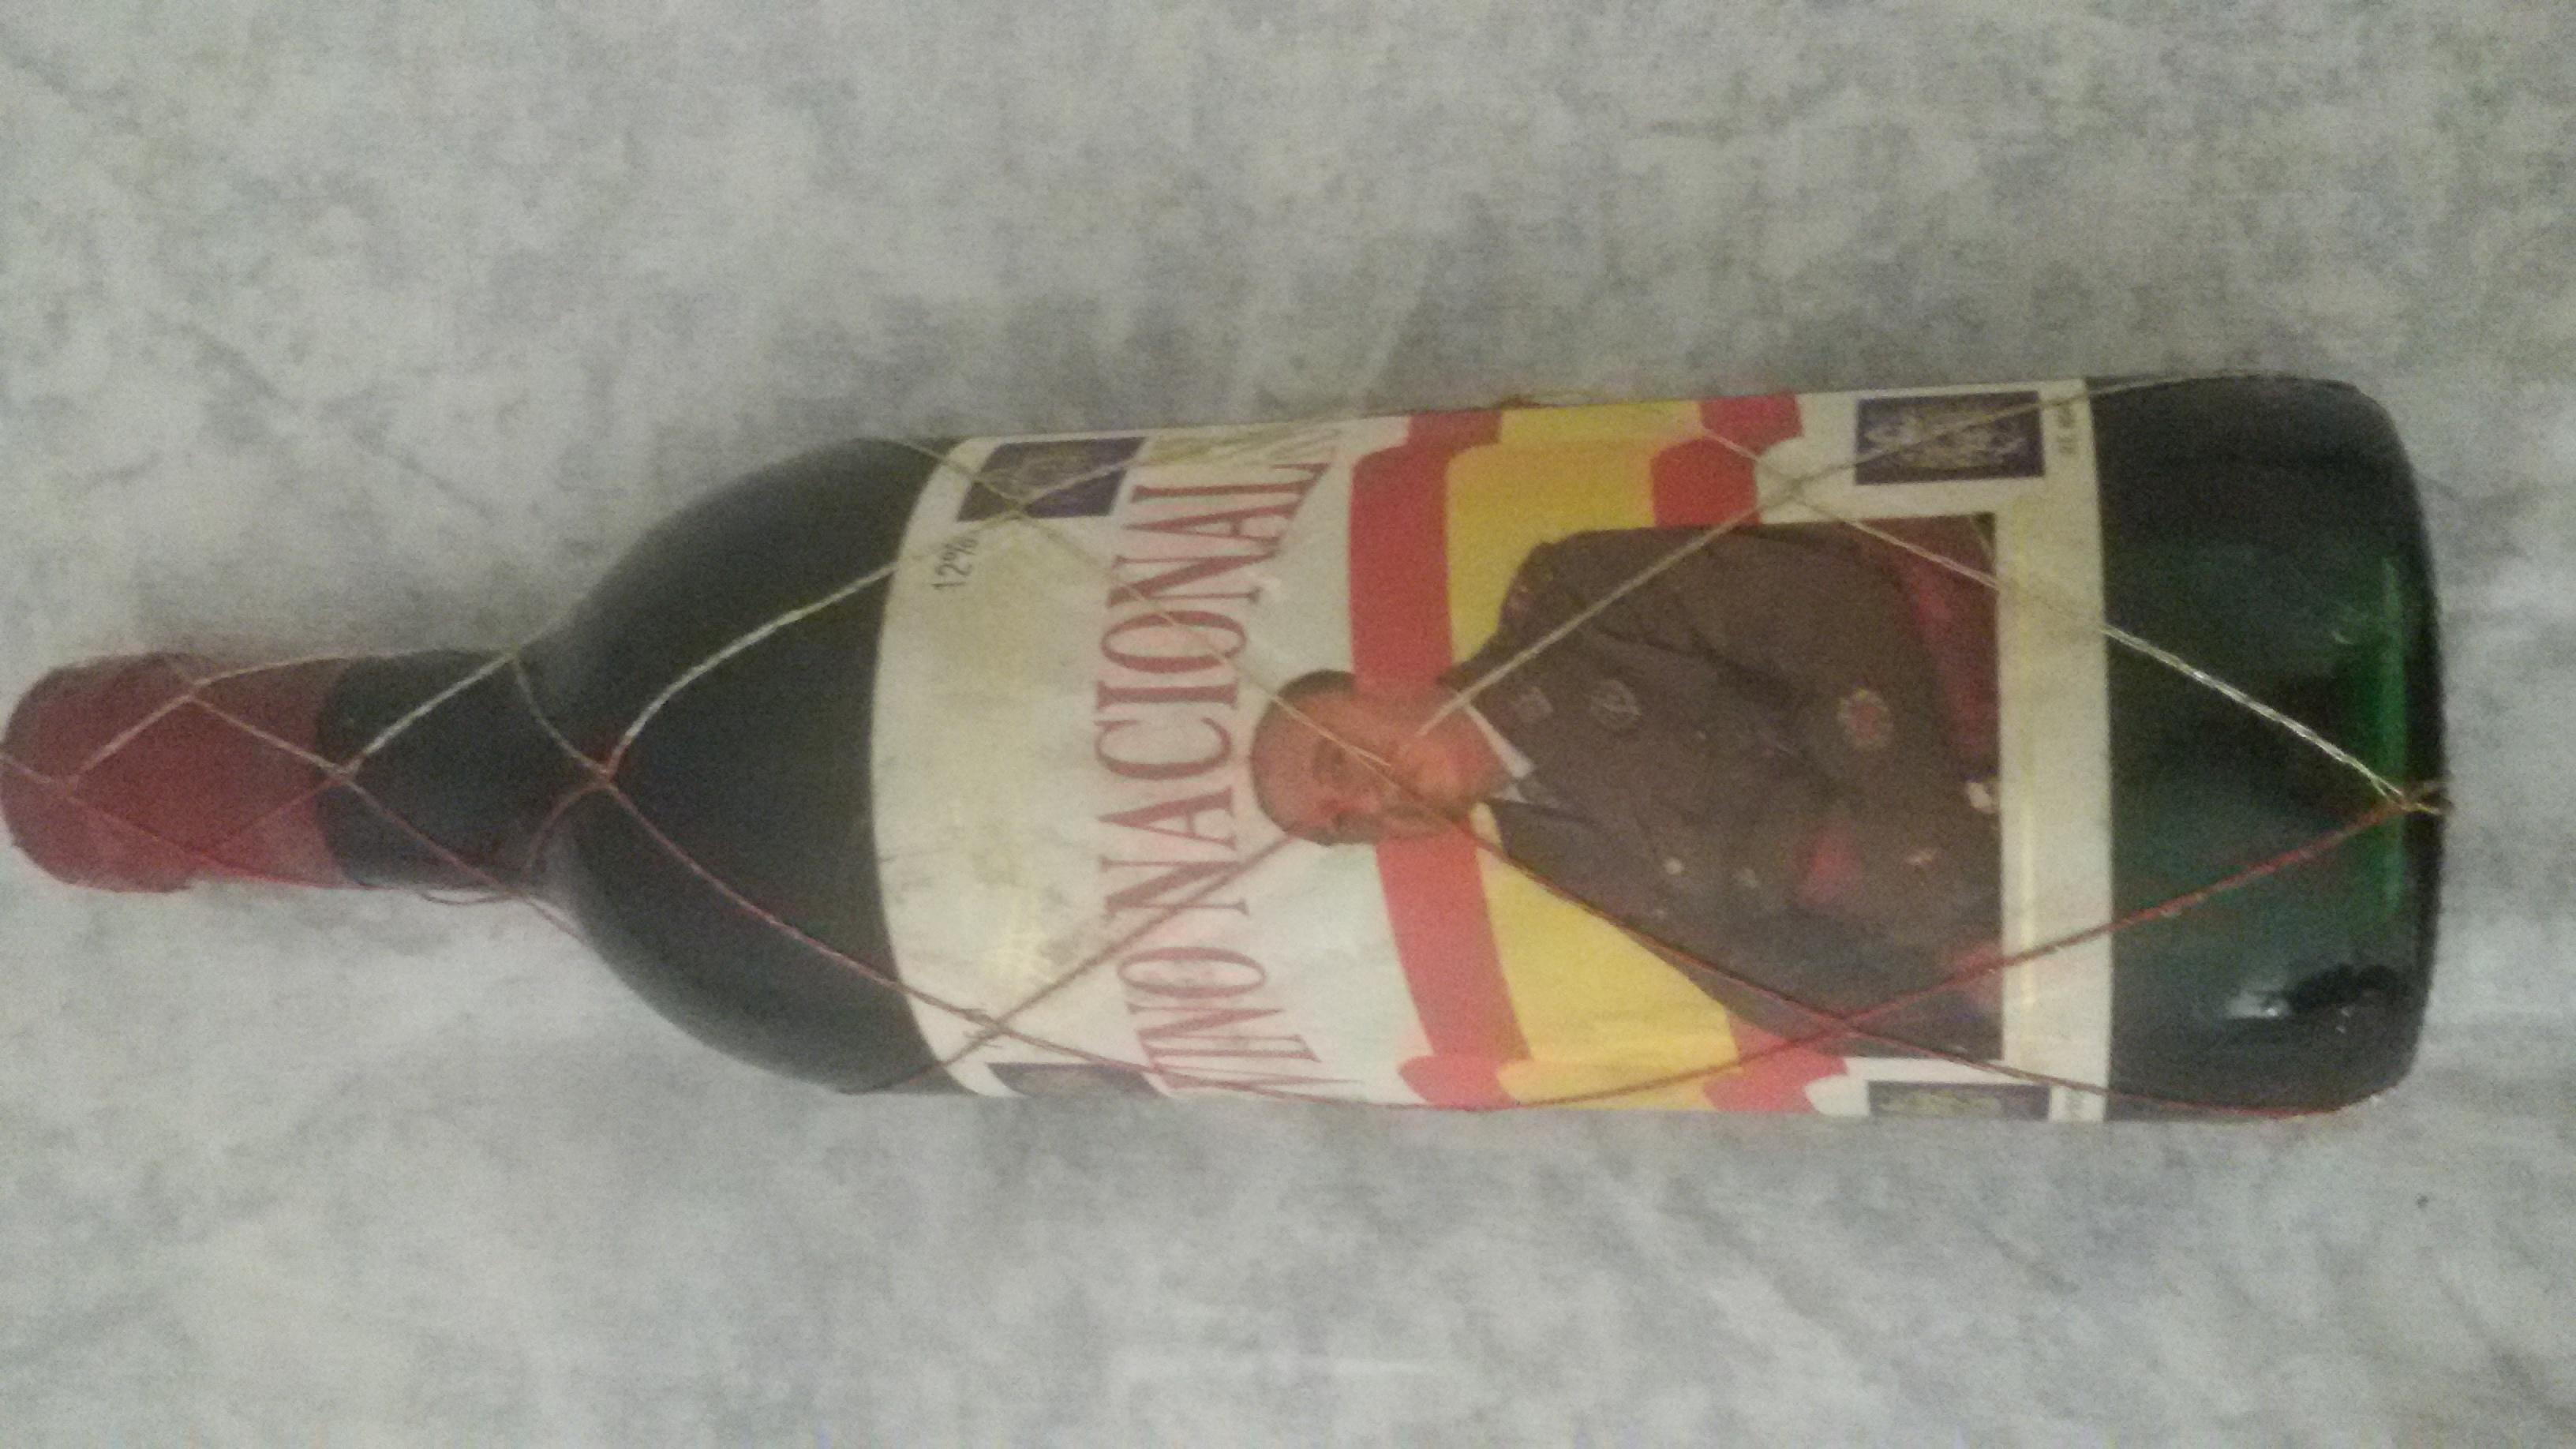 vinos añejos